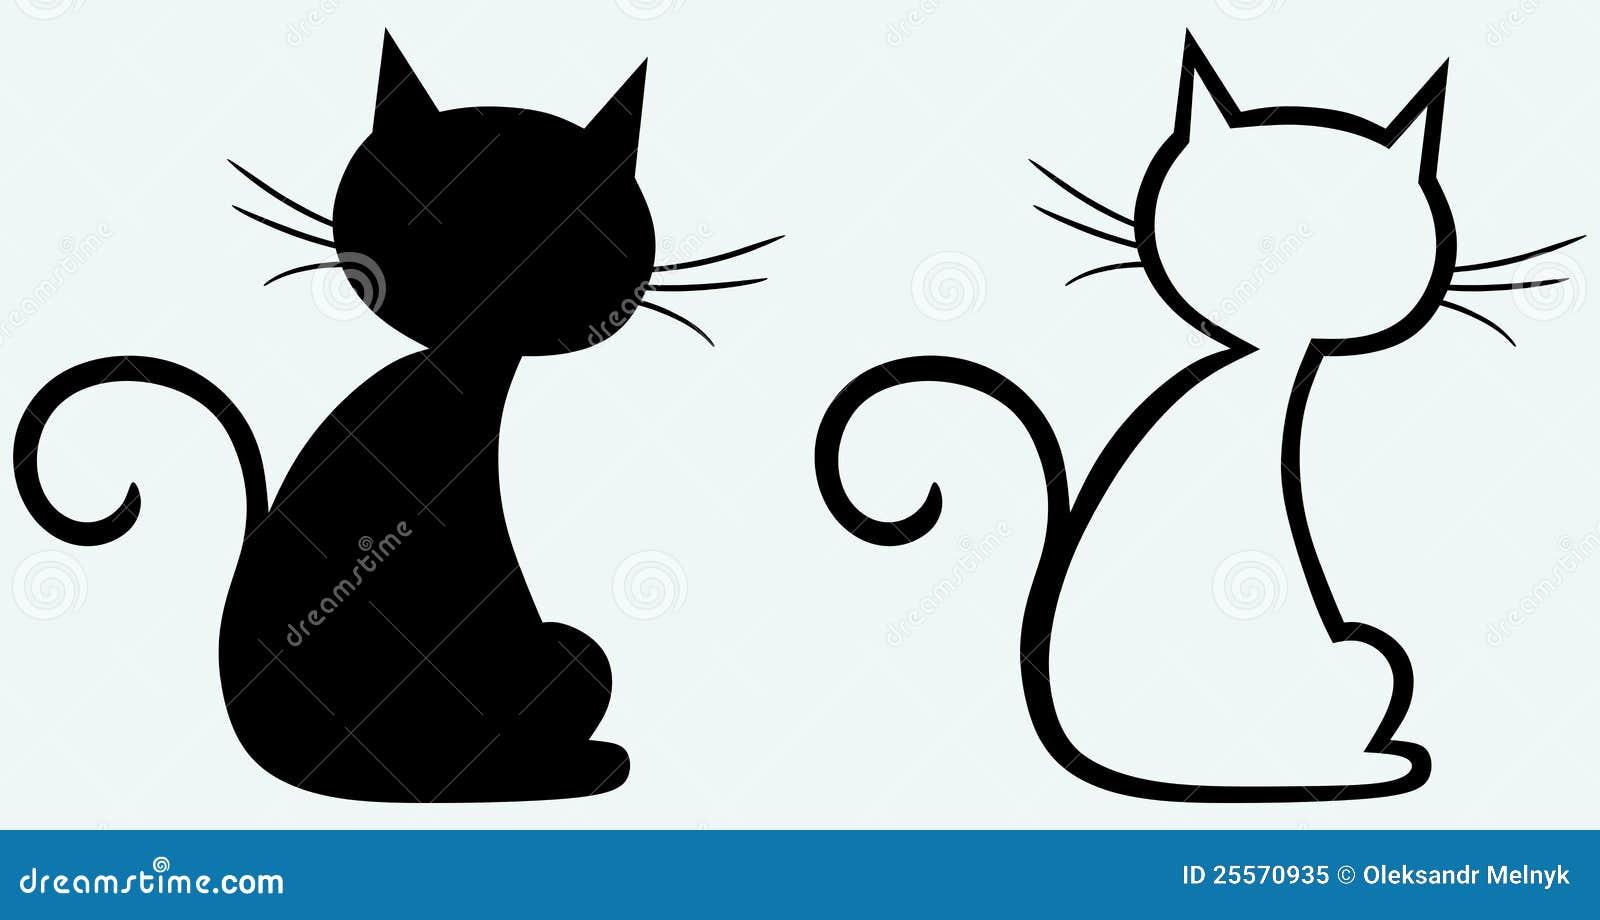 silueta de gato negro - photo #18